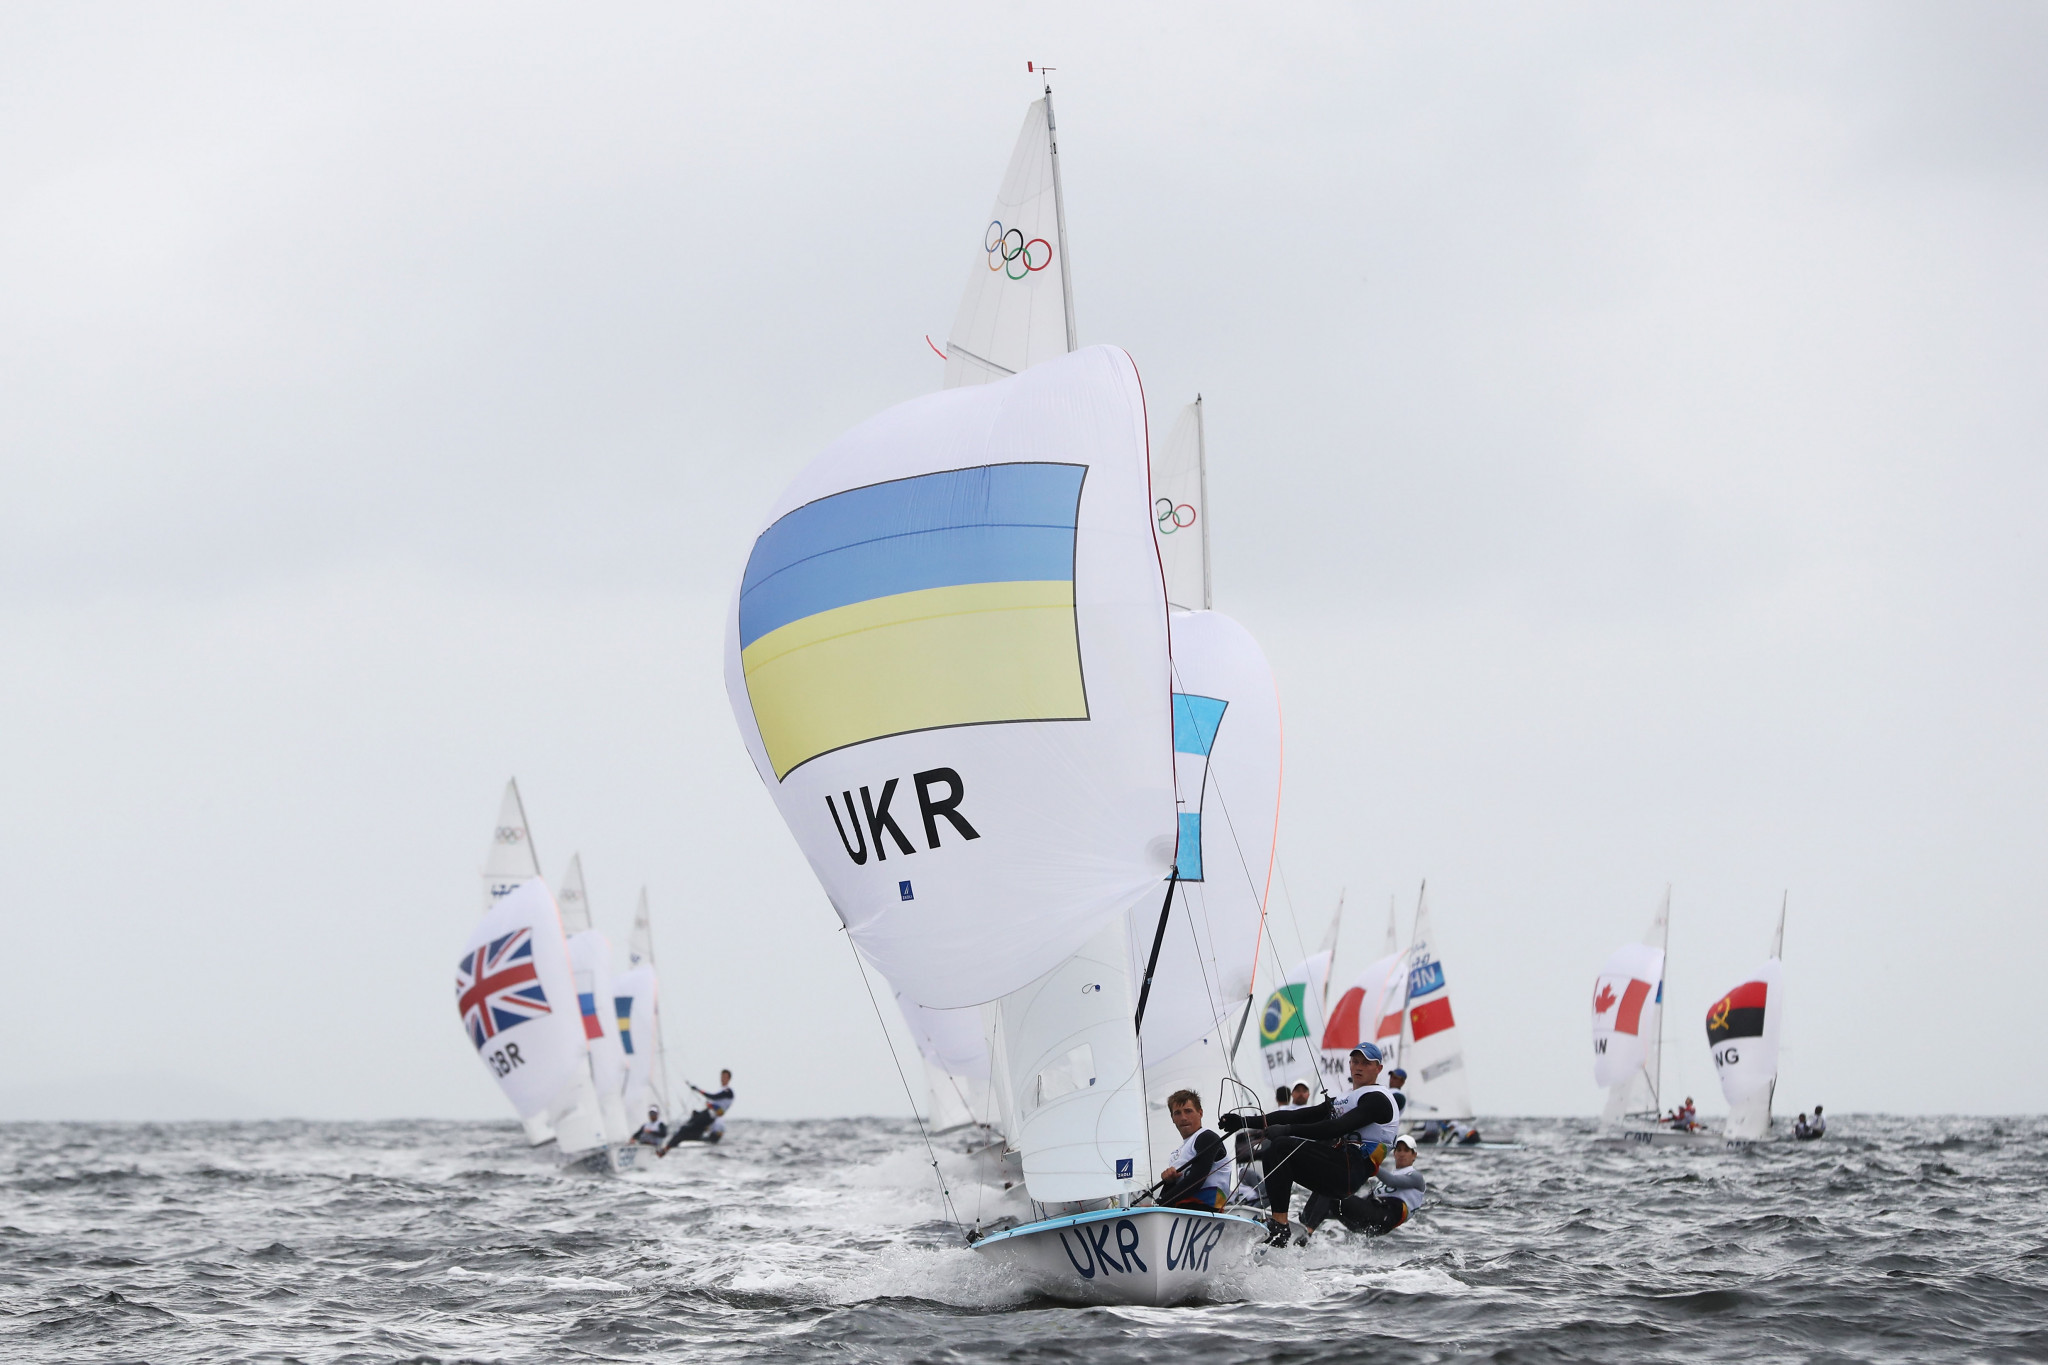 Ukraine ask World Sailing to ban Russia amid Crimea tension